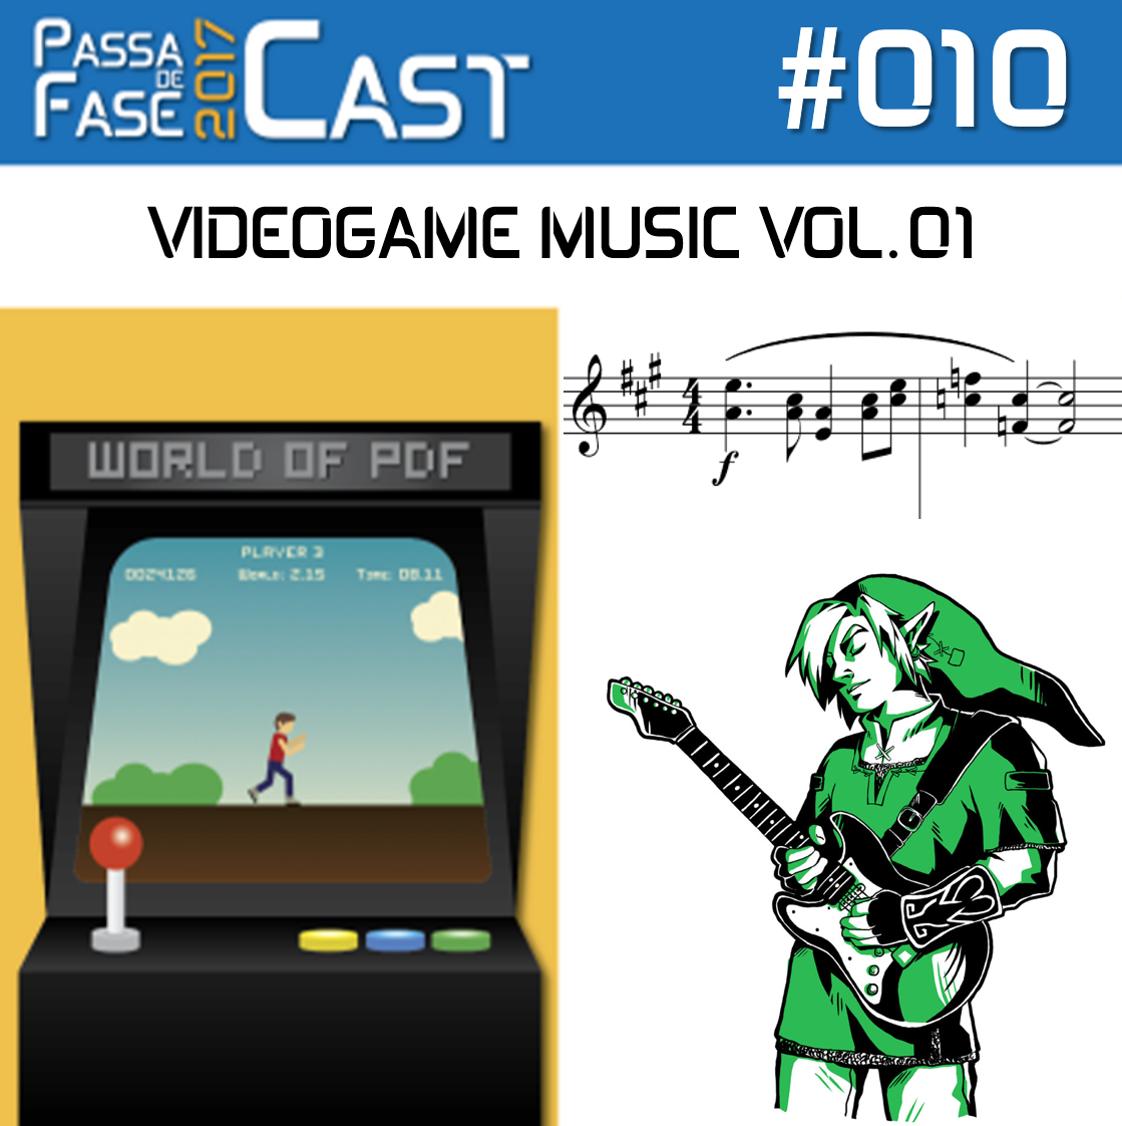 Passa de Fase Cast 2017 #010 | VIDEOGAME MUSIC VOL.01